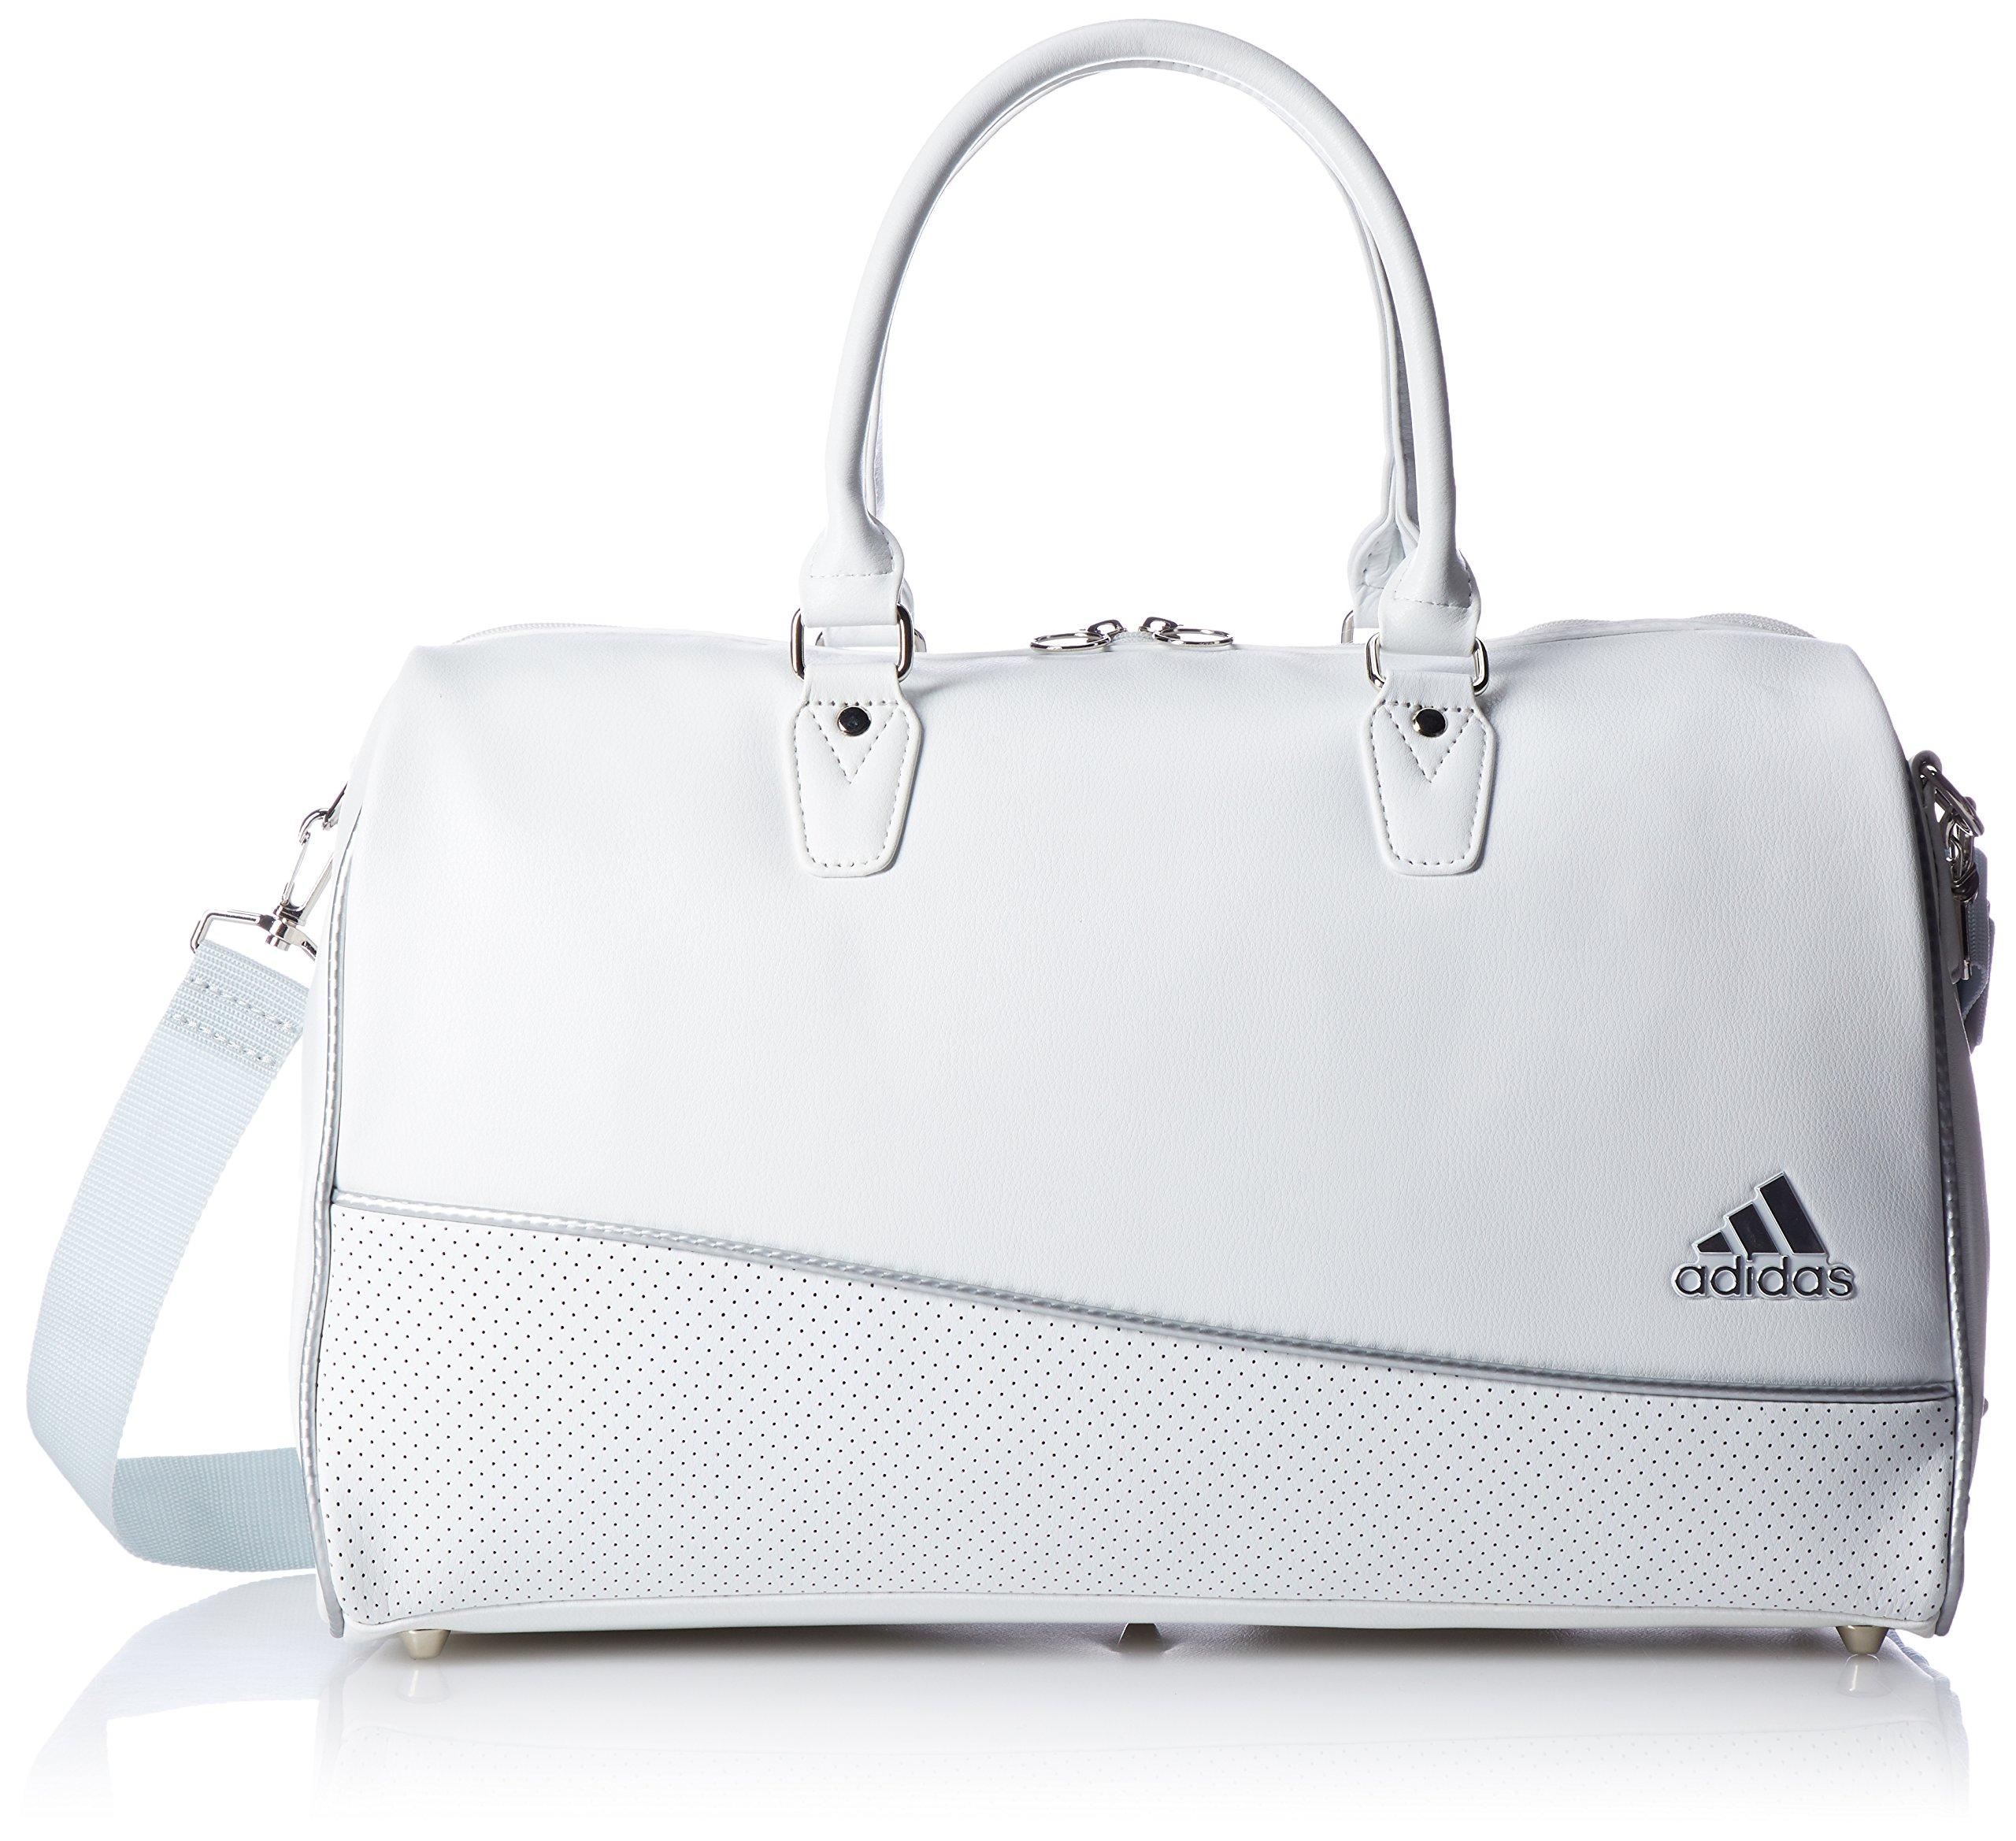 [AdidasGolf] Trip, L45 x W21 x H29 cm/awt91 - white -